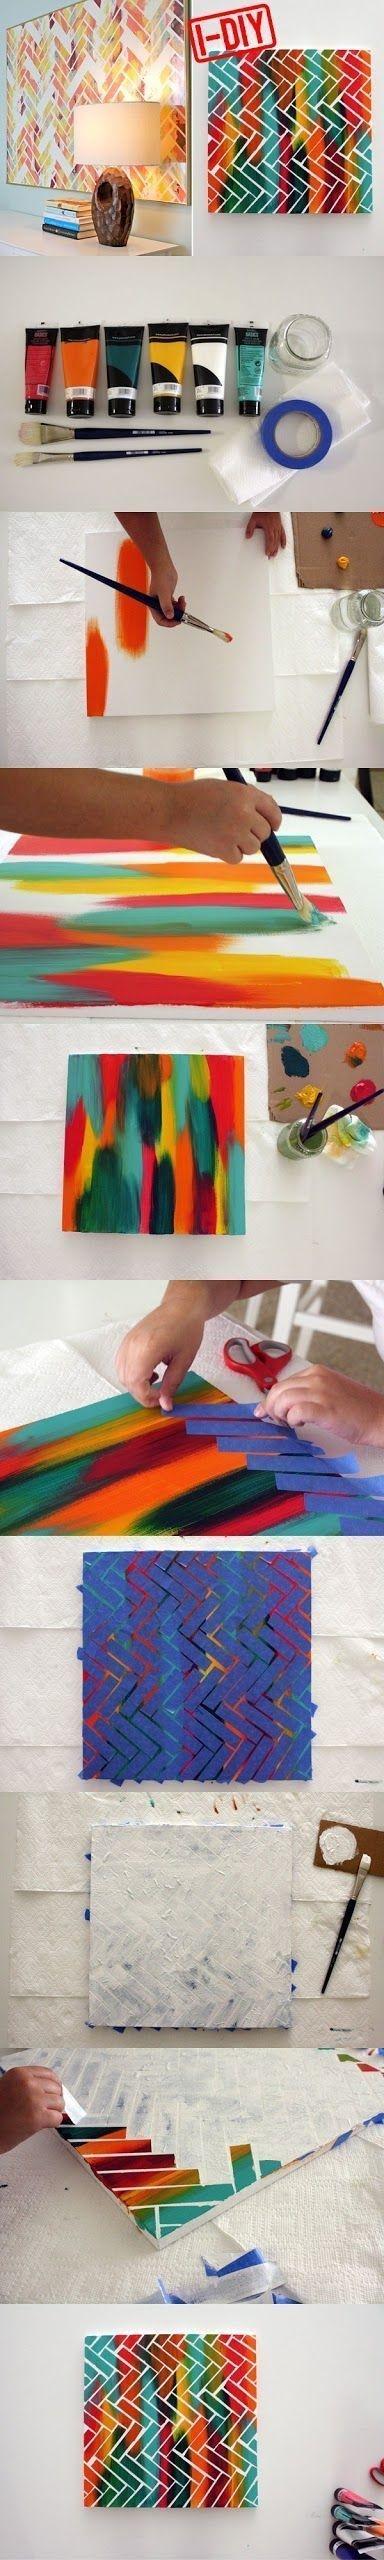 Cand banalul devine arta: Decoratiuni din orice aveti la indemana - Poza 10